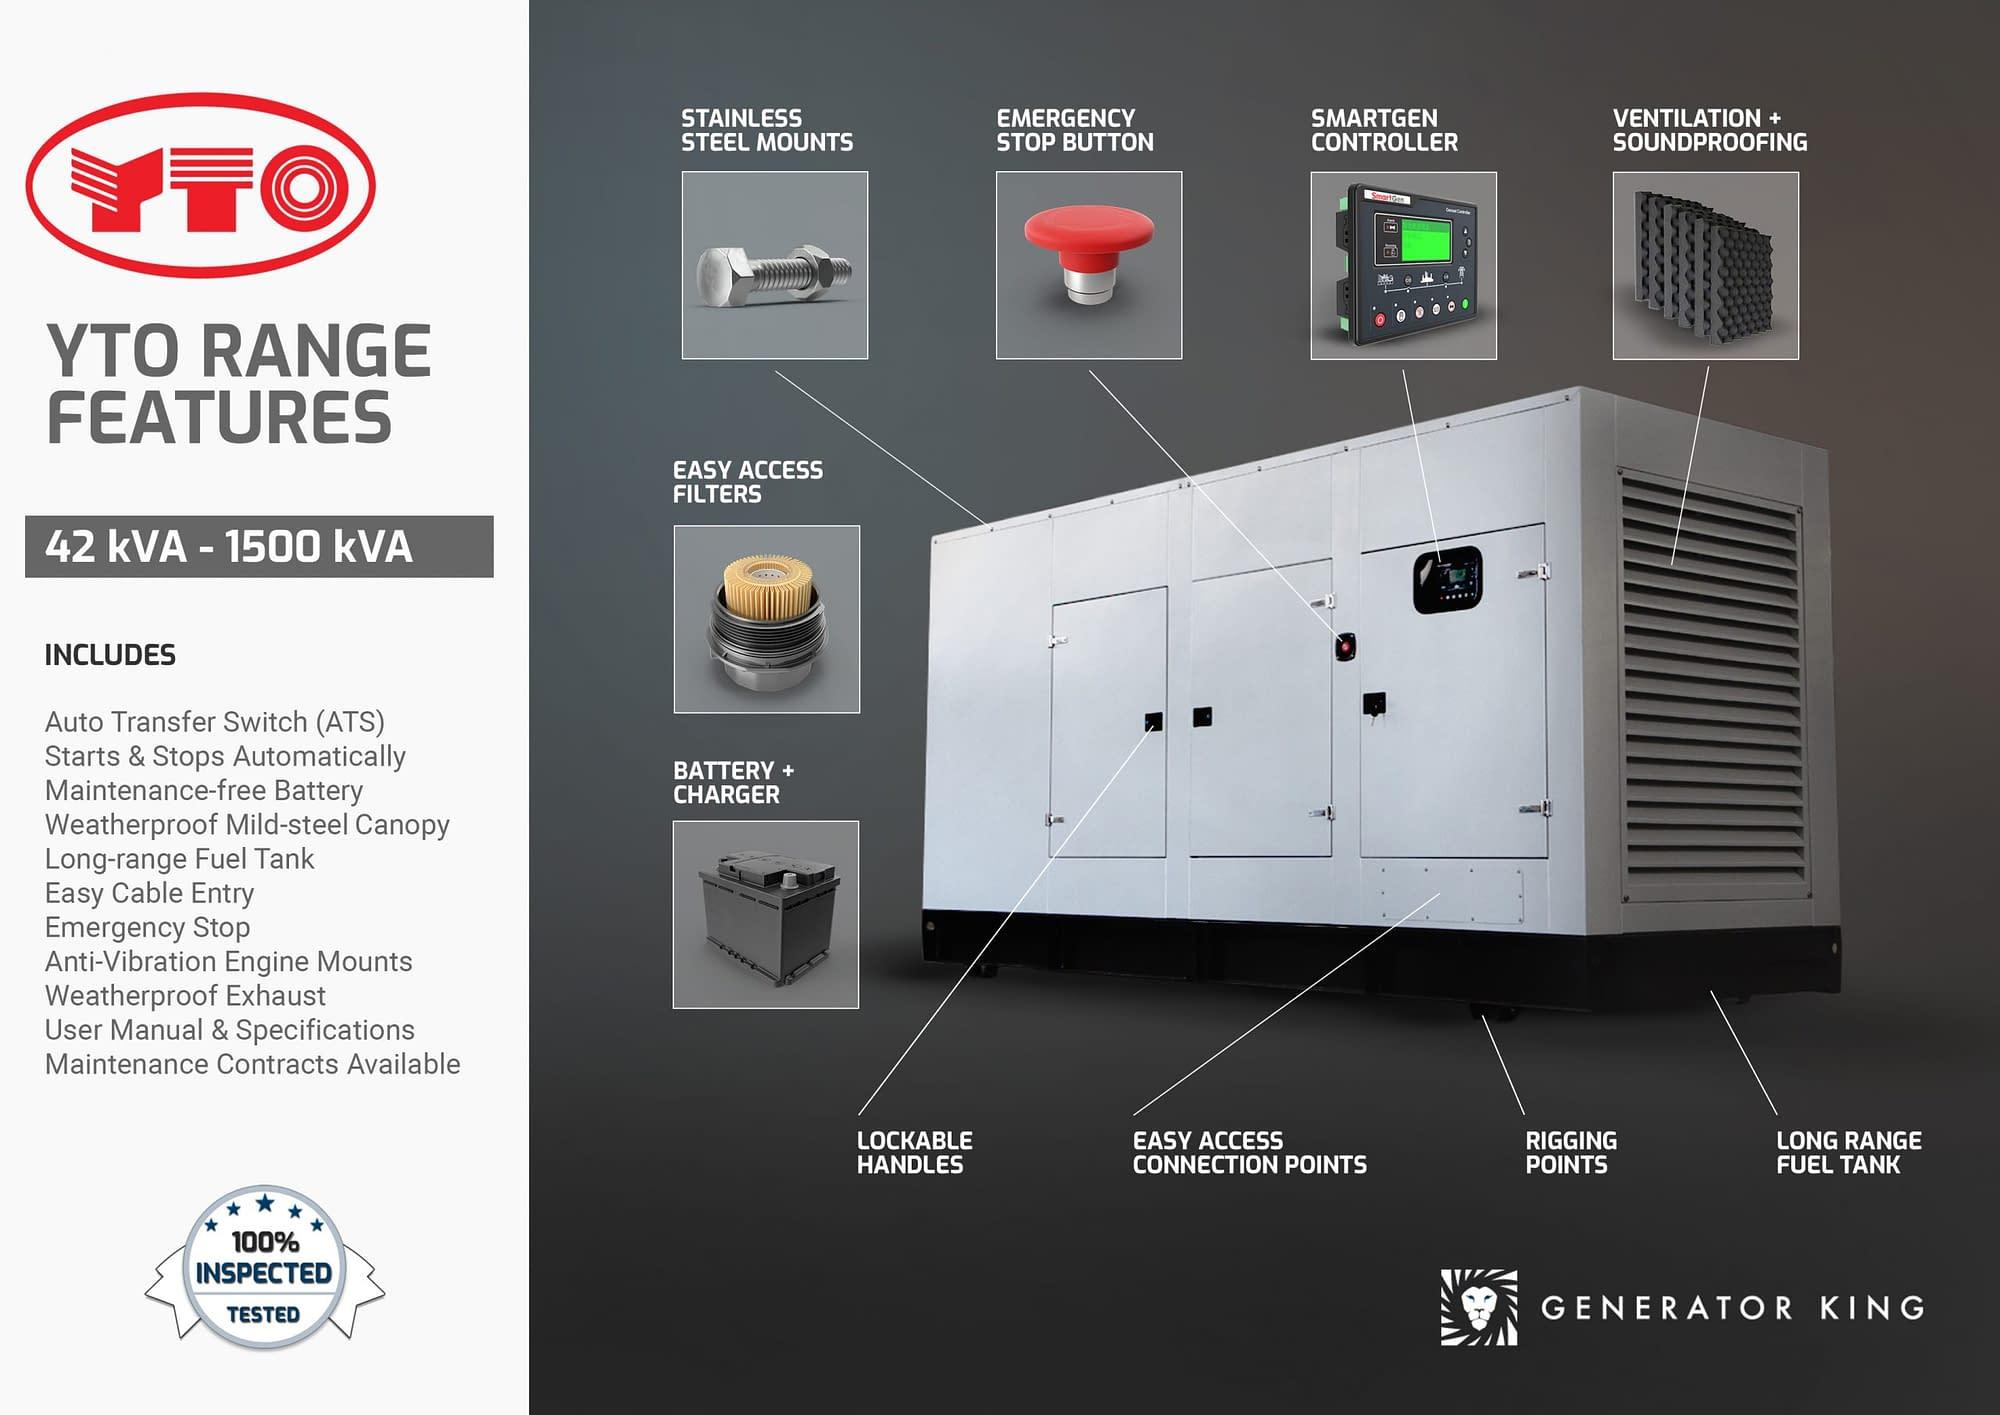 Diesel Generator for Sale | YTO Generators Features | Generator King